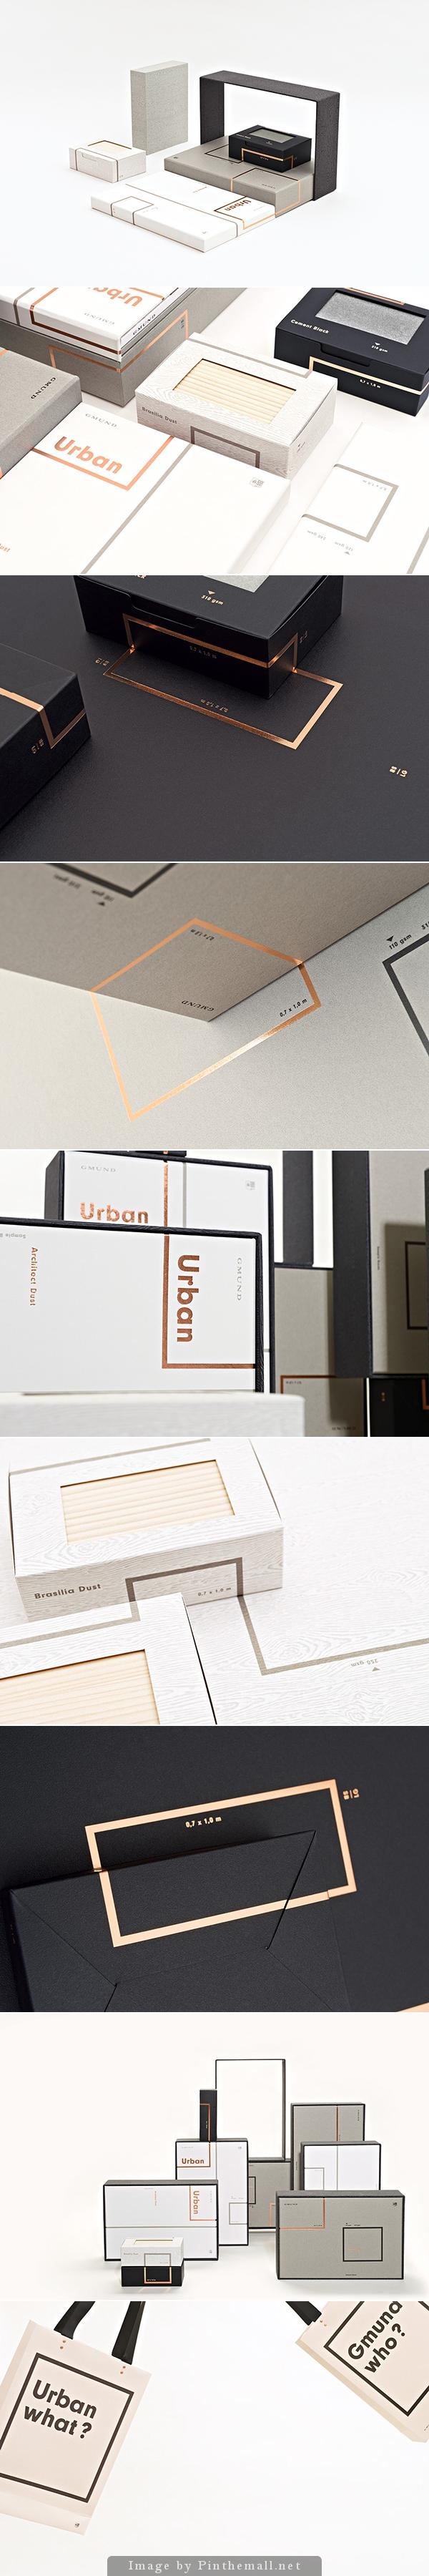 GMUND Urban – Working Tool